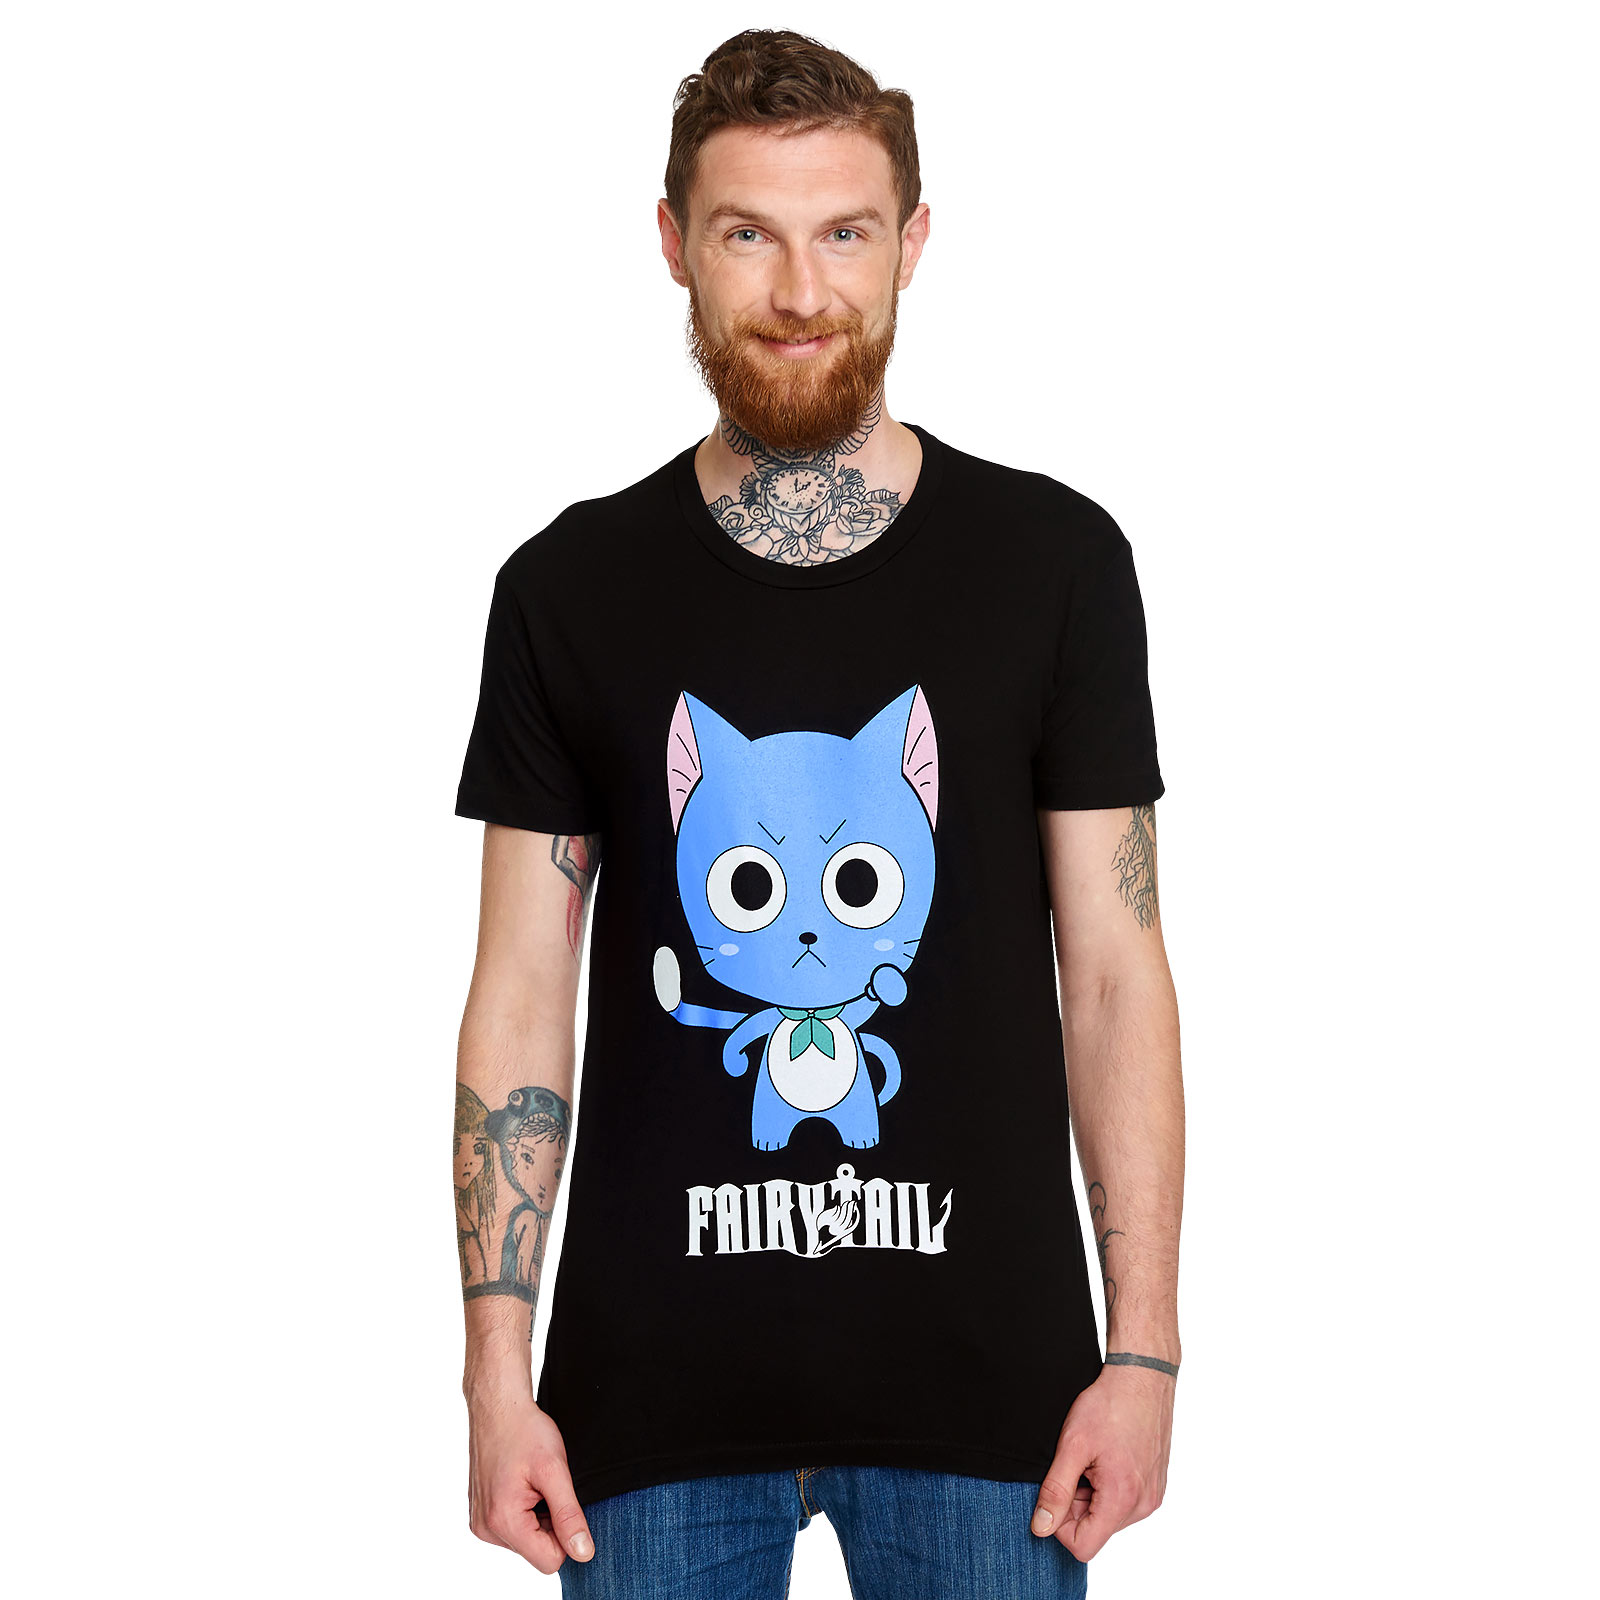 Fairy Tail - Happy T-Shirt schwarz